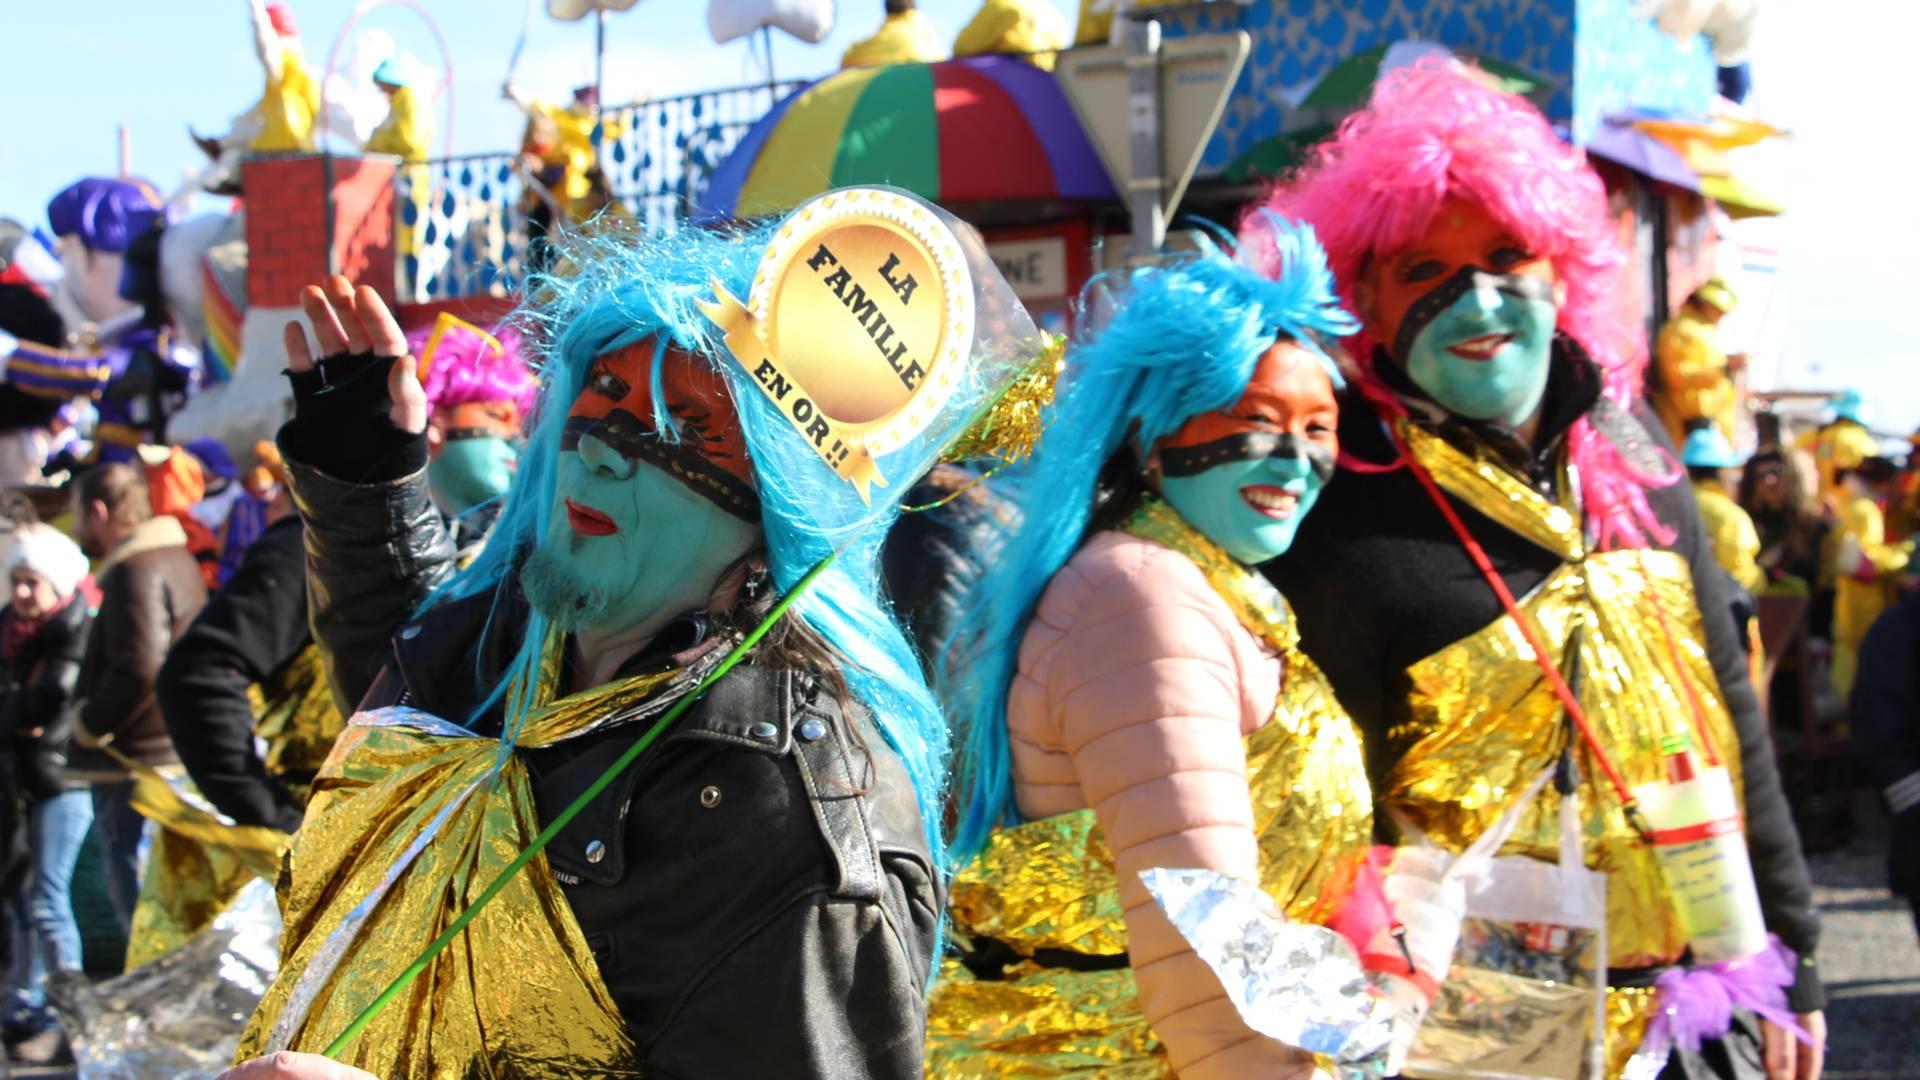 Carnaval de Granville 2017 - Cavalcade du Mardi